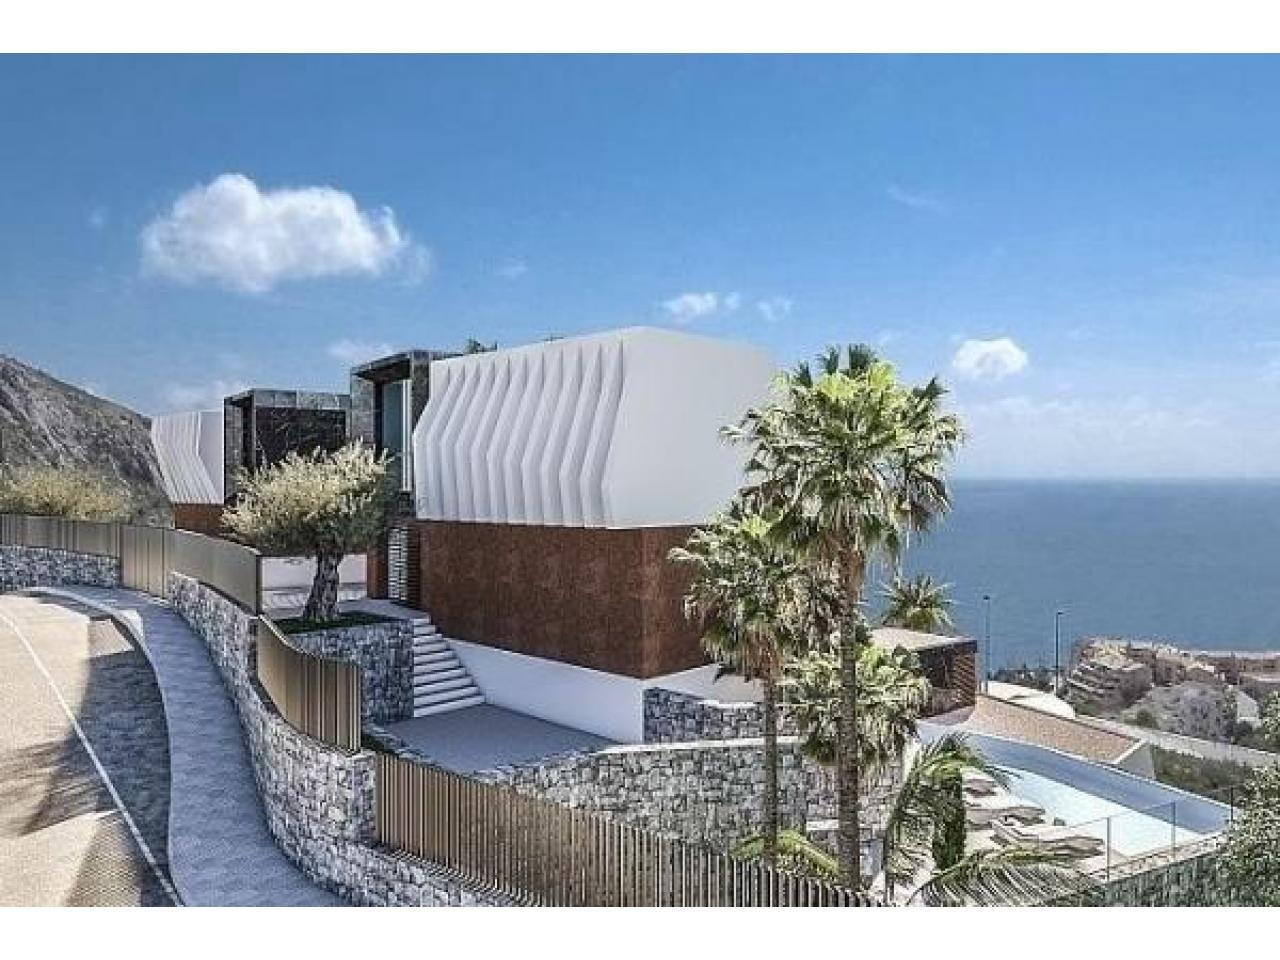 Недвижимость в Испании, Новая вилла с видами на море от застройщика в Альтеа,Коста Бланка,Испания - 3